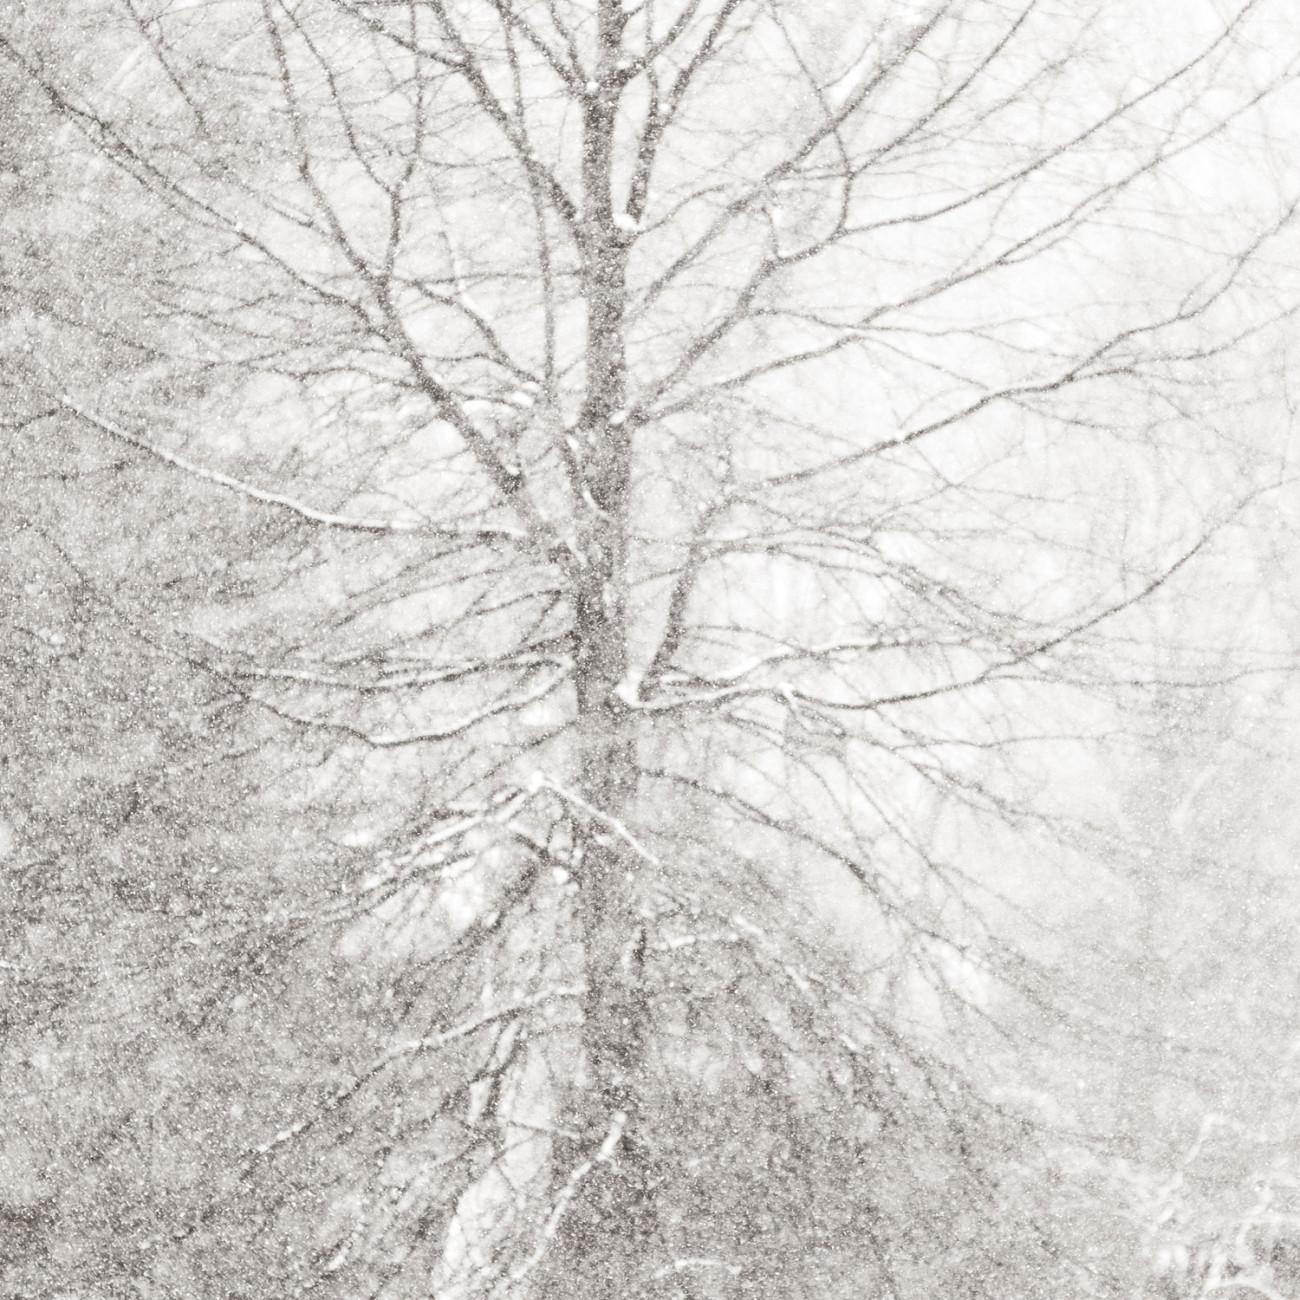 Falling snow and rree, Washington, Conn., 2008